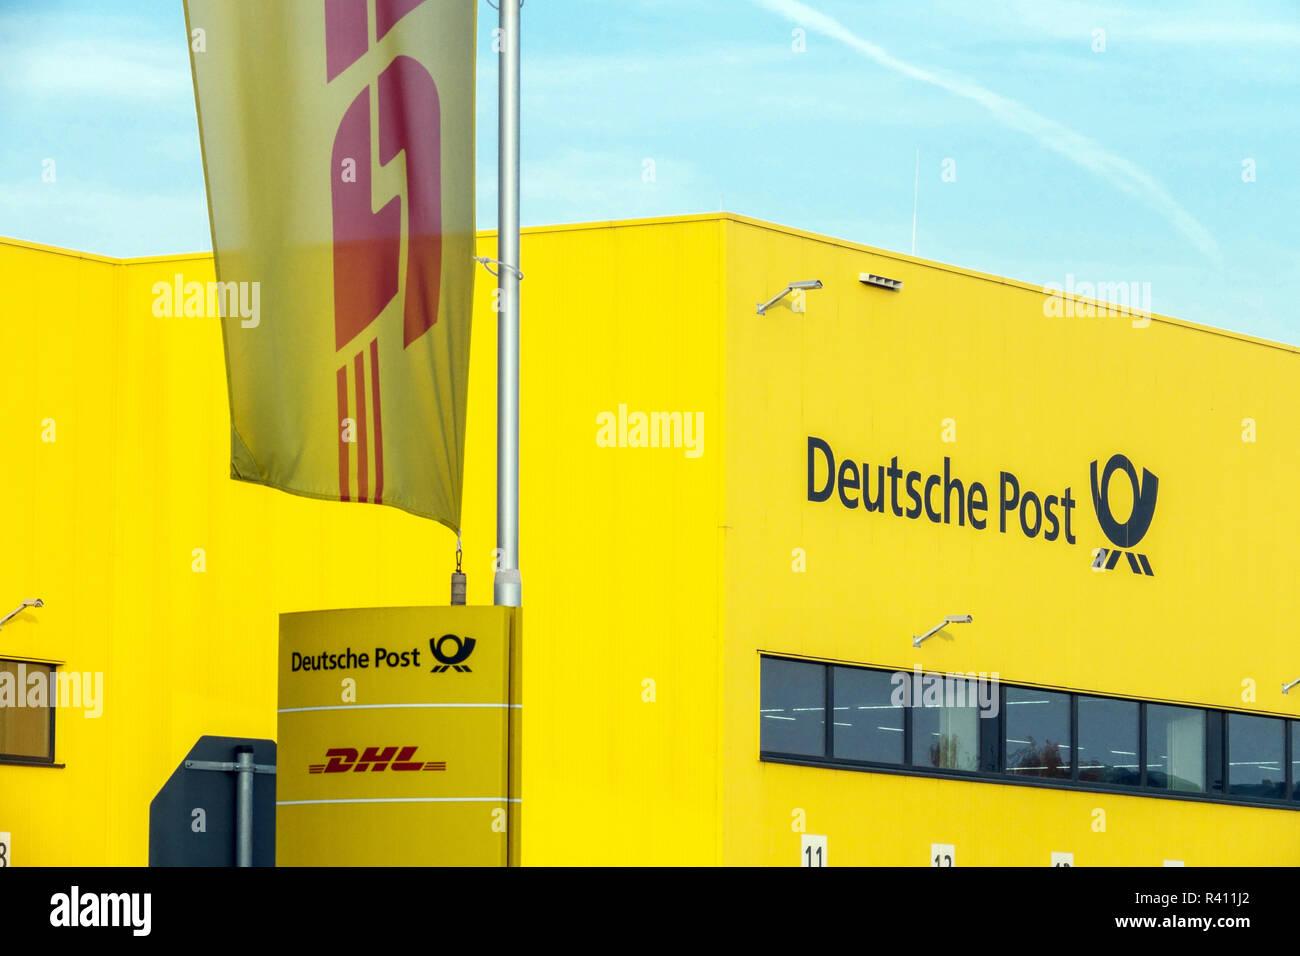 Deutsche Post, DHL Distribution Center, Berlin Germany - Stock Image